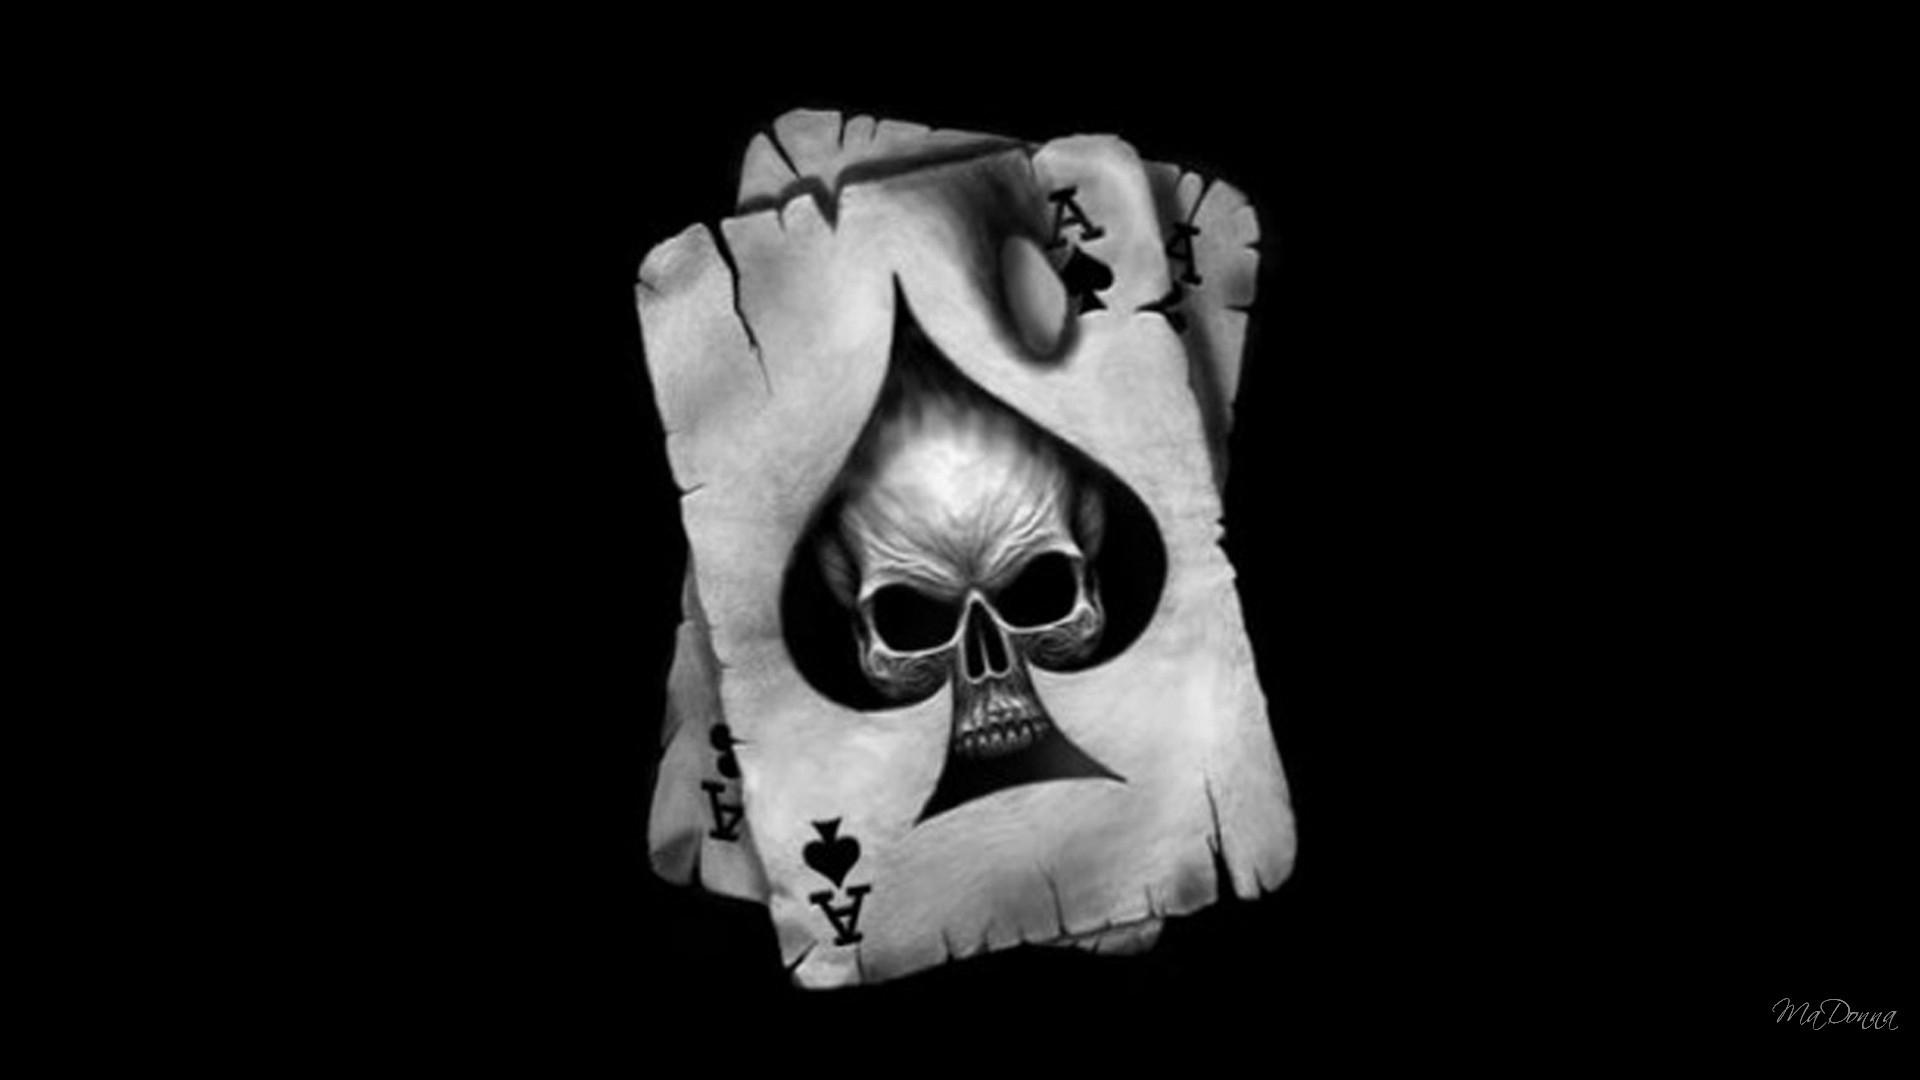 Download Ace Of Skulls Wallpaper Full HD Wallpapers 1920x1080